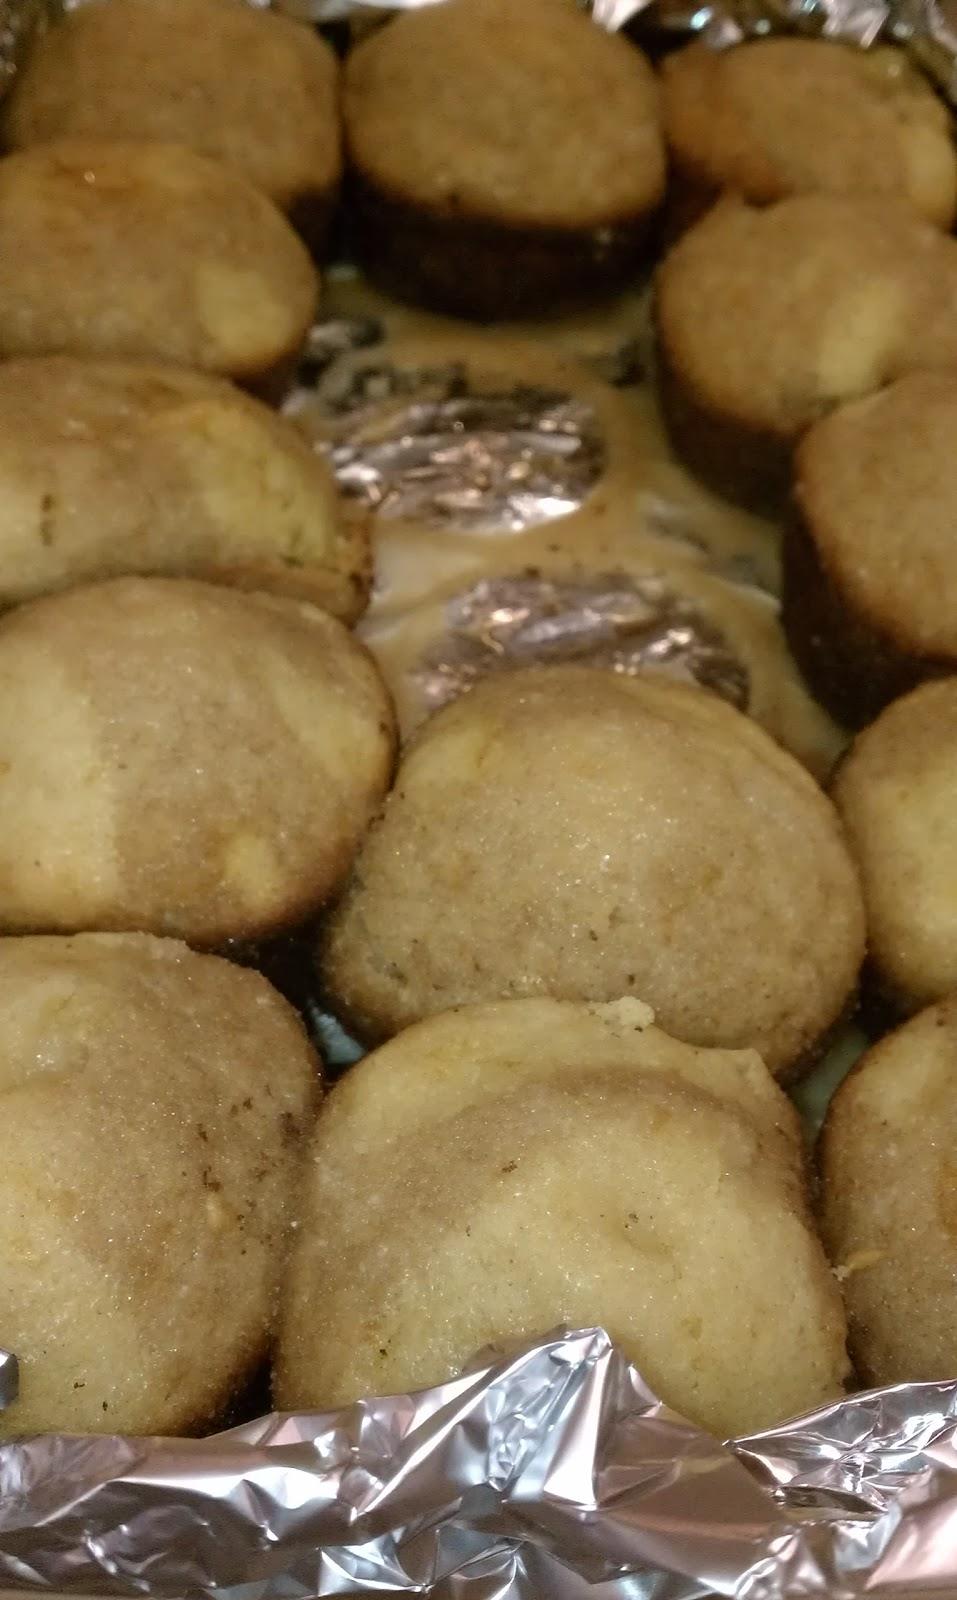 ... kitchen.: Pioneer Woman's Orange Mini-Muffins with Brown Sugar Glaze